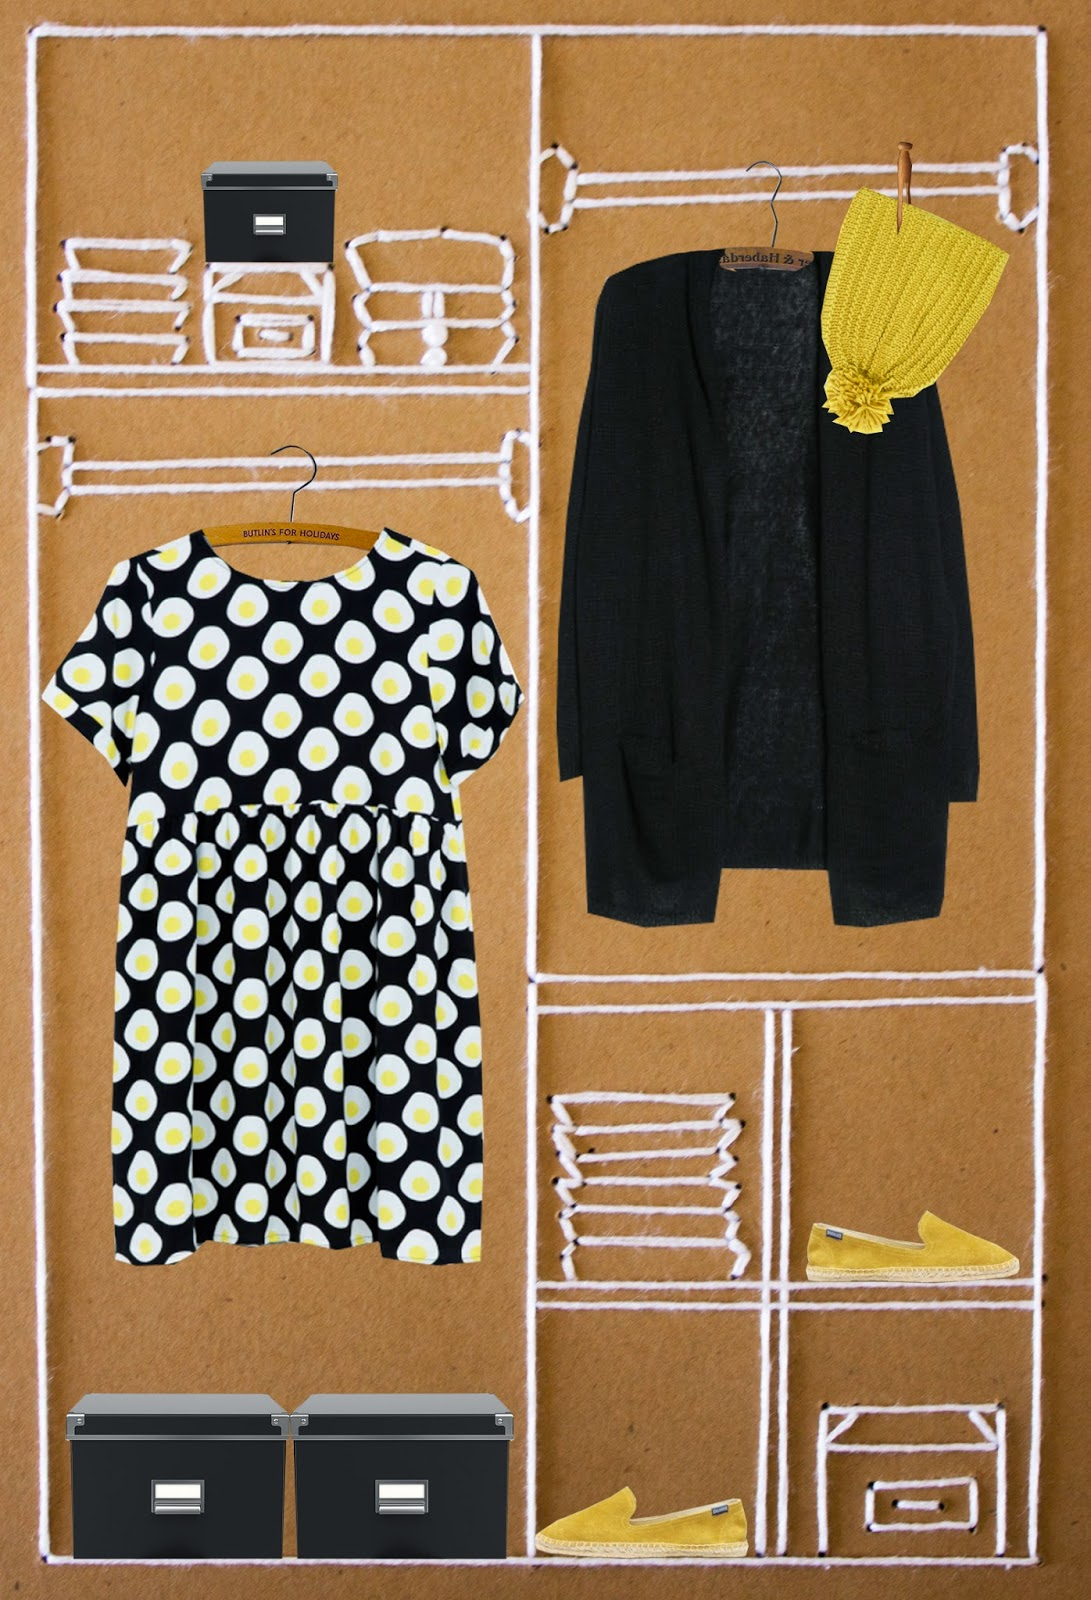 egg print dress, soludos espadrilles suede, pompom knit hat zara, mango oversized cardigan, mixed media art, fashion illustration, tlv birdie style blog